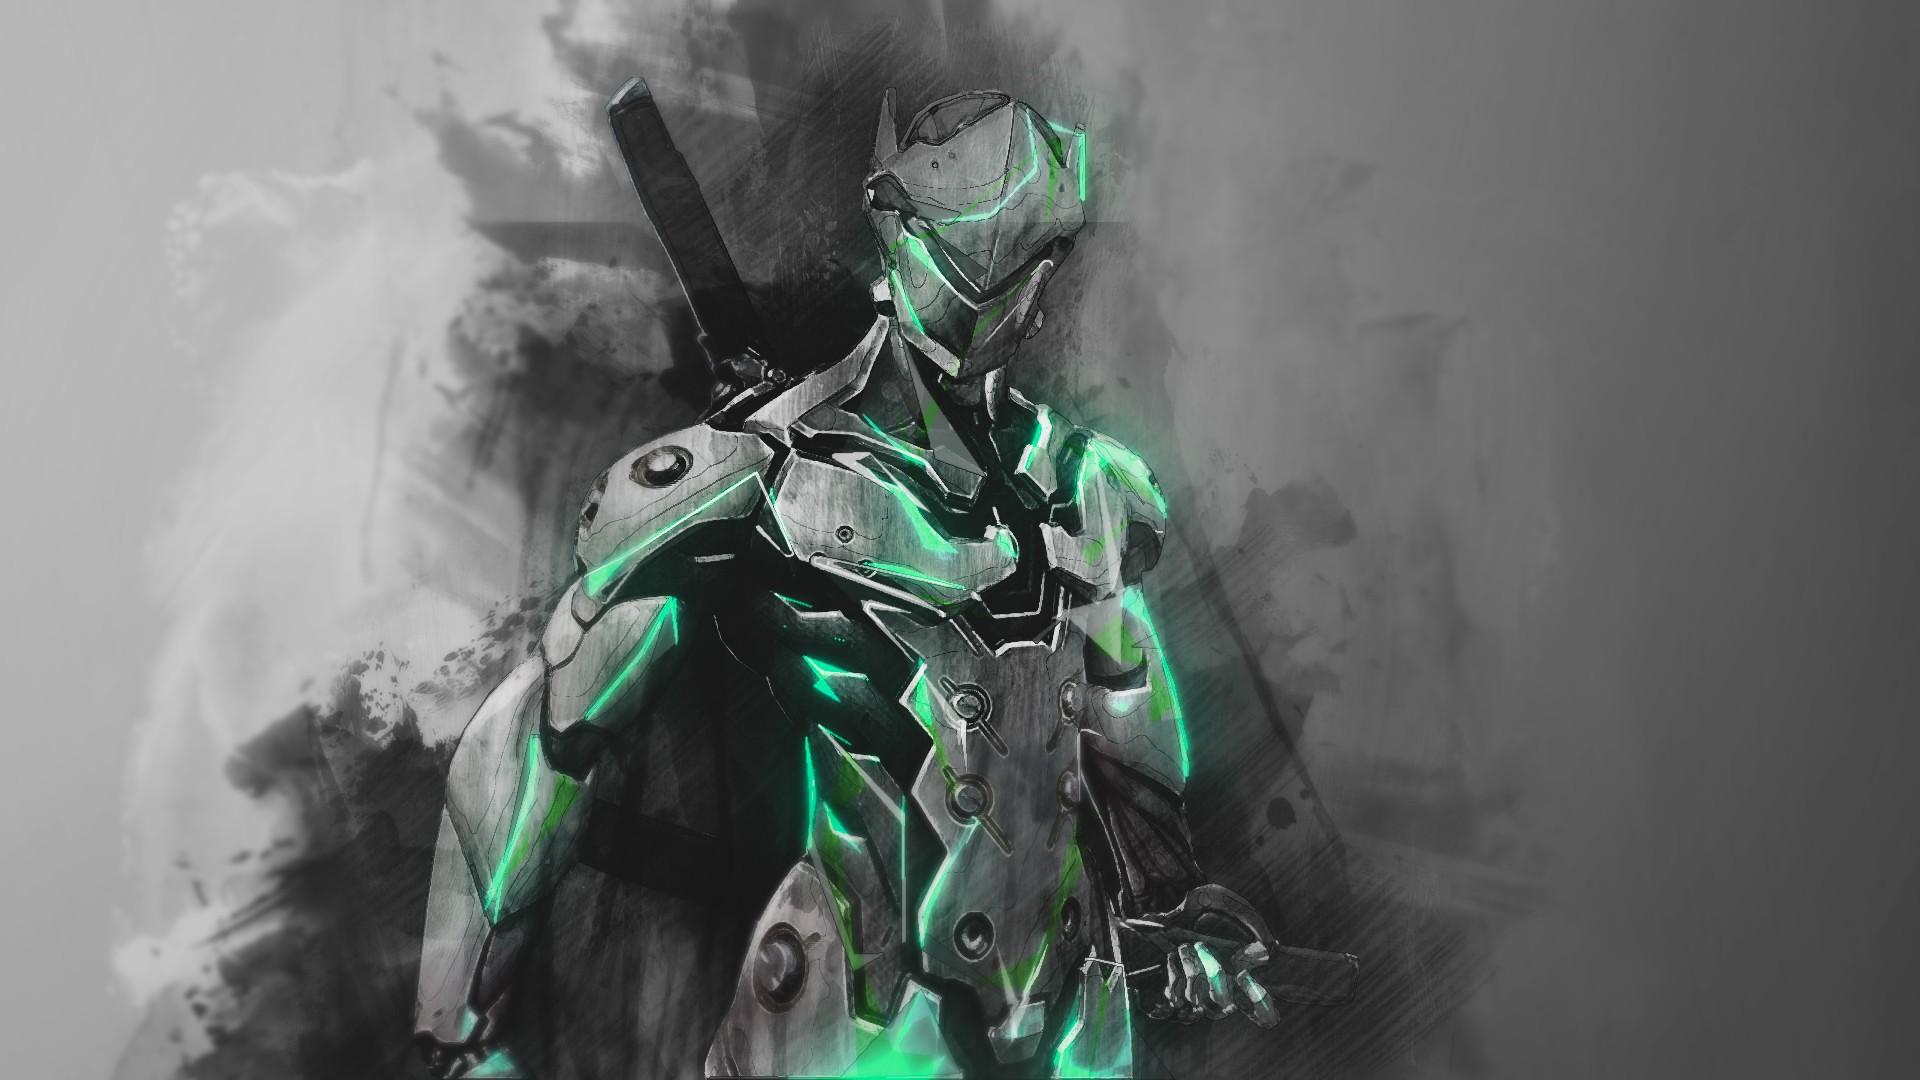 Overwatch wallpaper HD ·① Download free beautiful HD ...